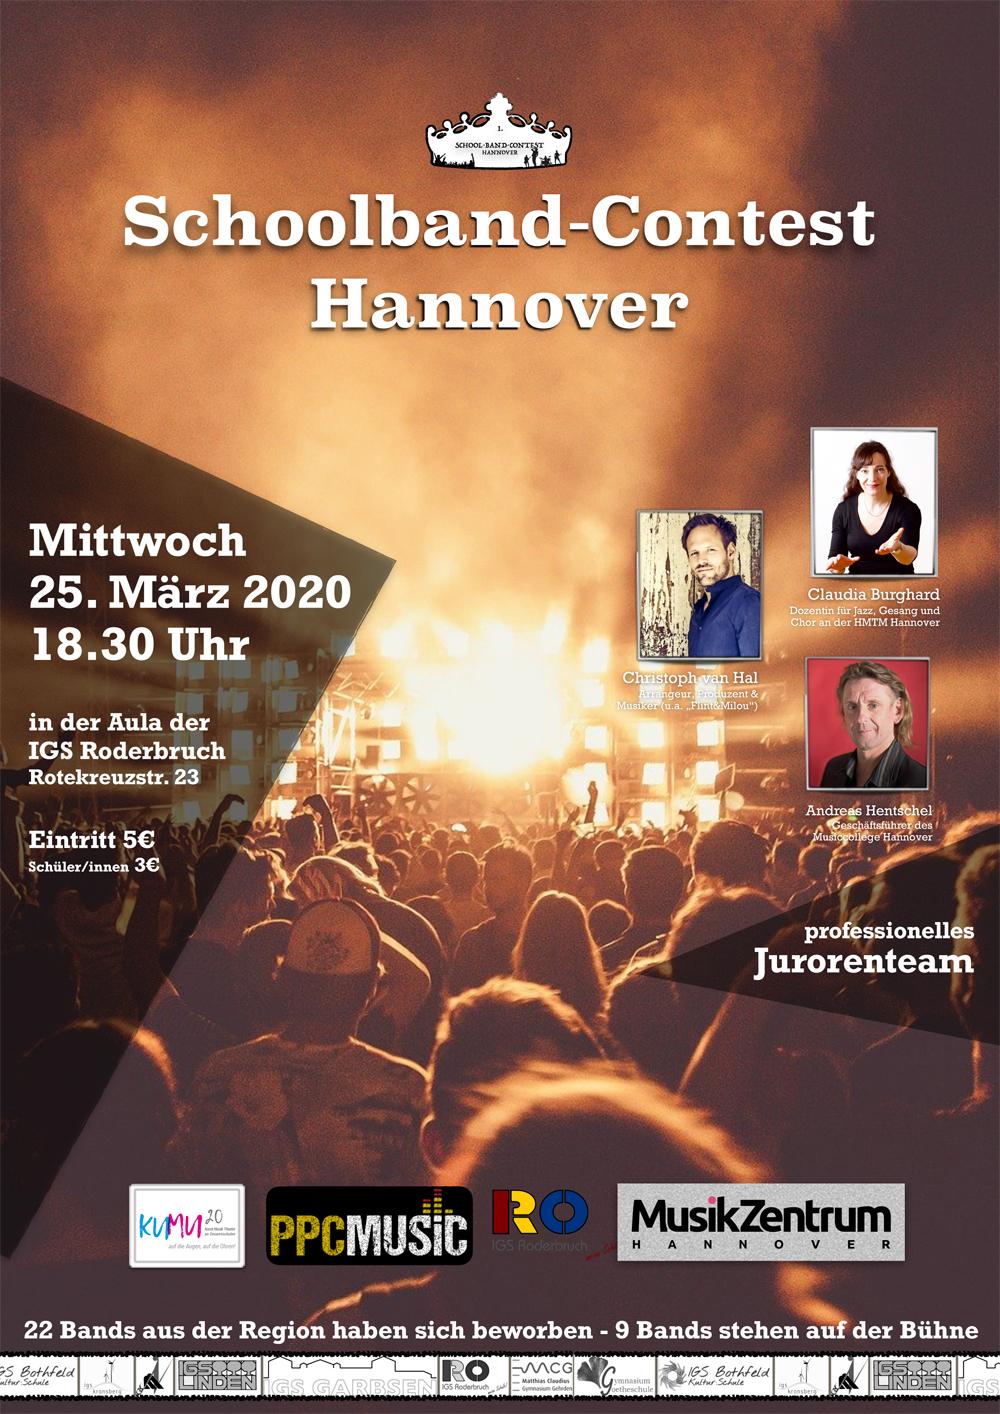 Igs Roderbruch Projekt 1 Schoolband Contest 2020 Hannover Kumu20